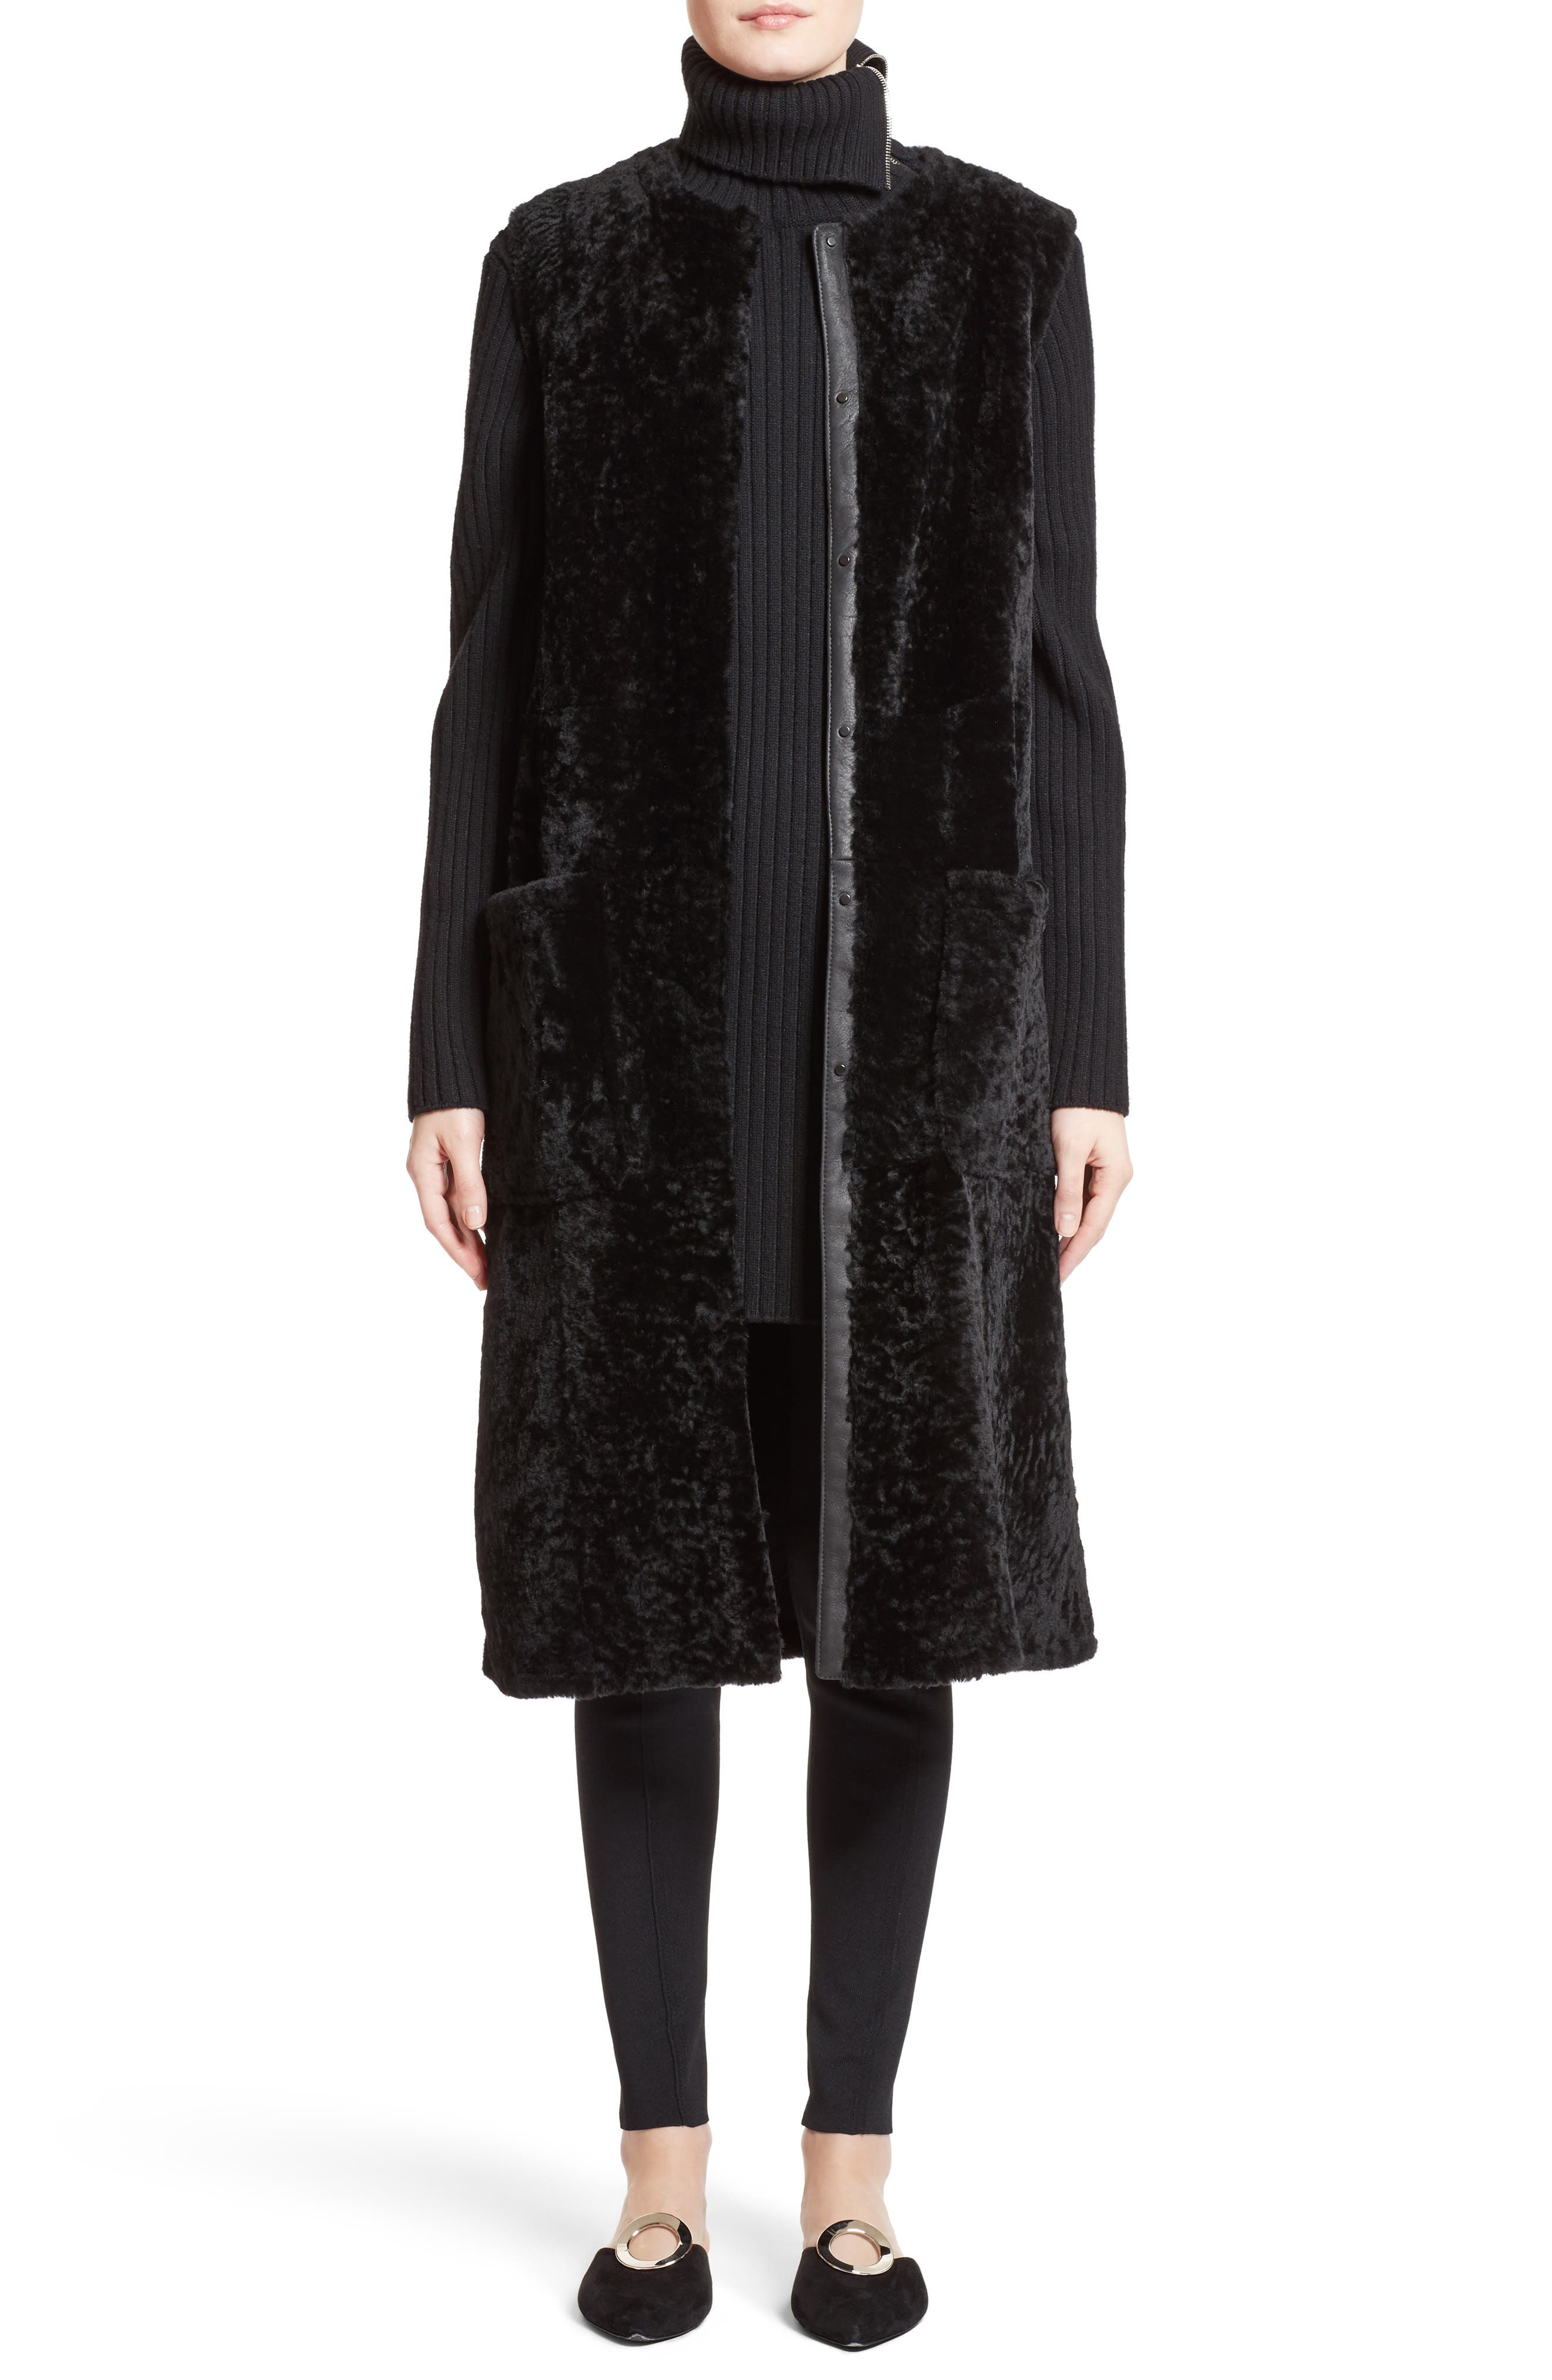 Wool & Cashmere Blend Turtleneck Dress,                             Alternate thumbnail 6, color,                             001